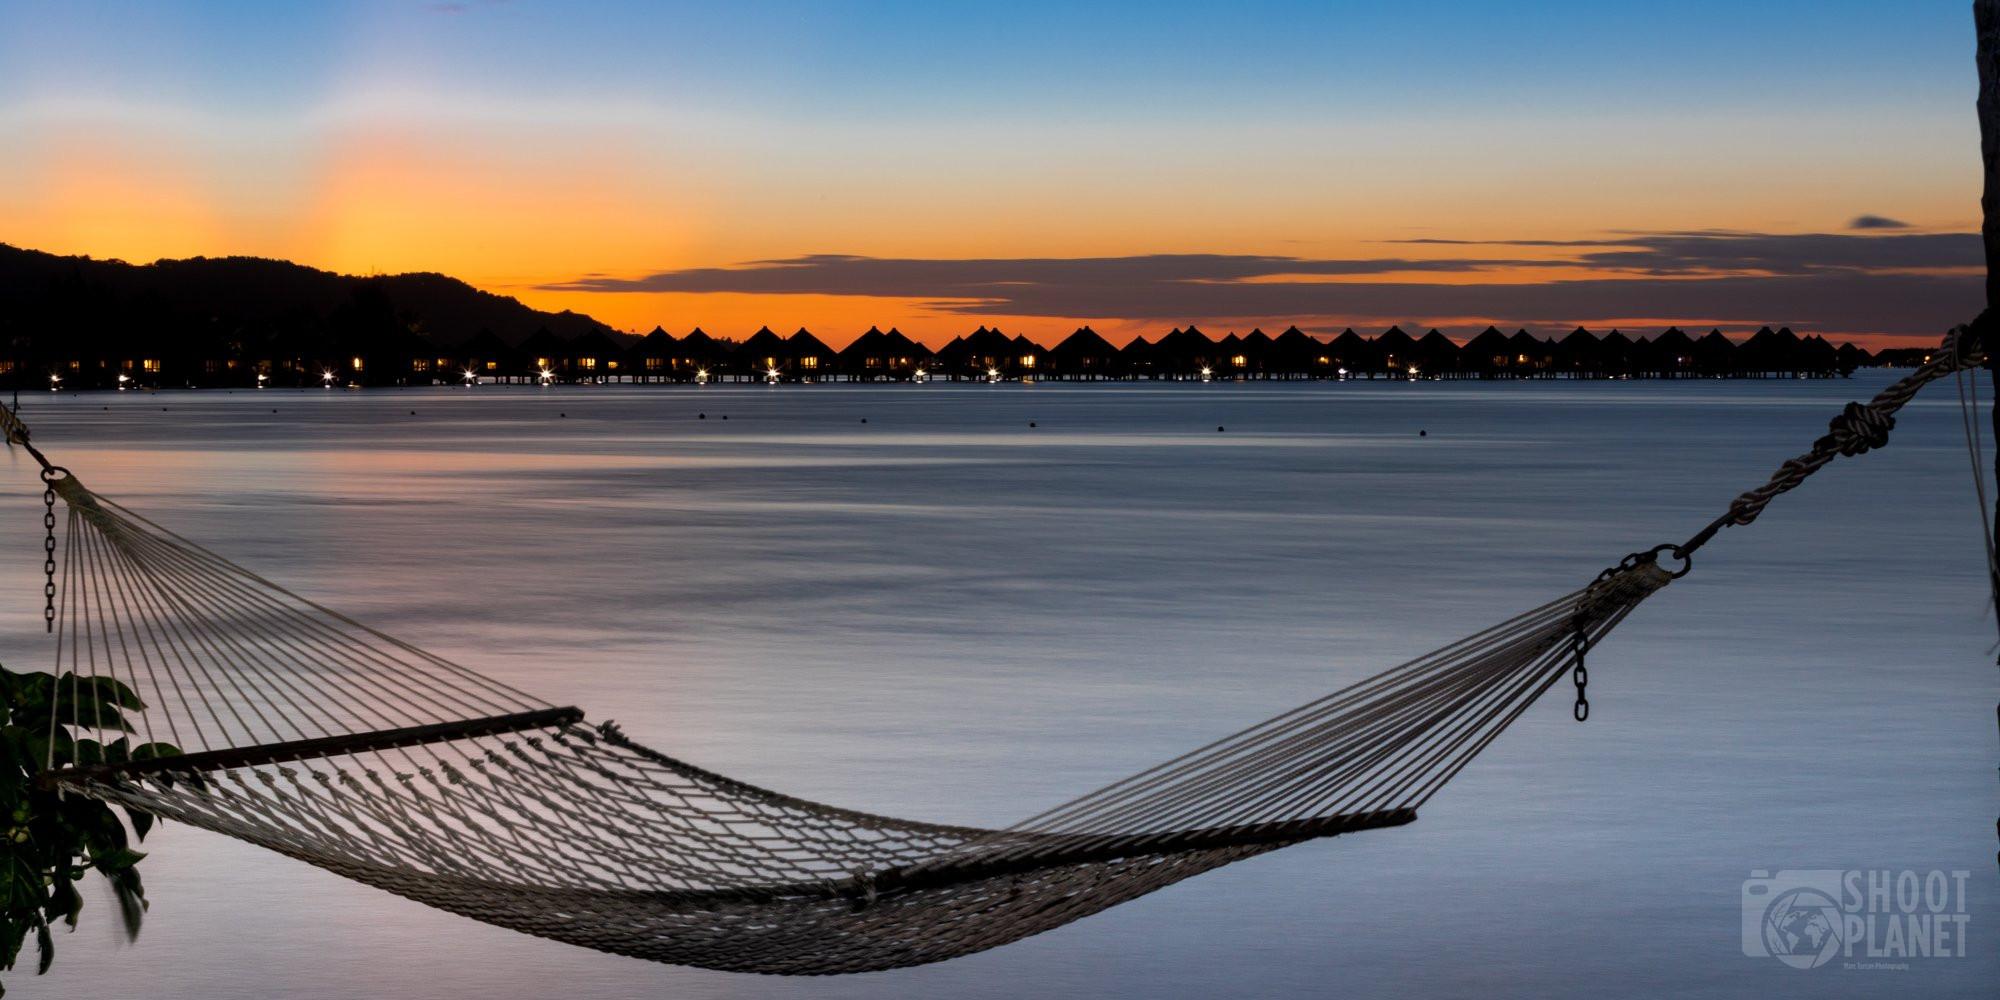 Hammock and overwater bungalows Bora Bora sunset